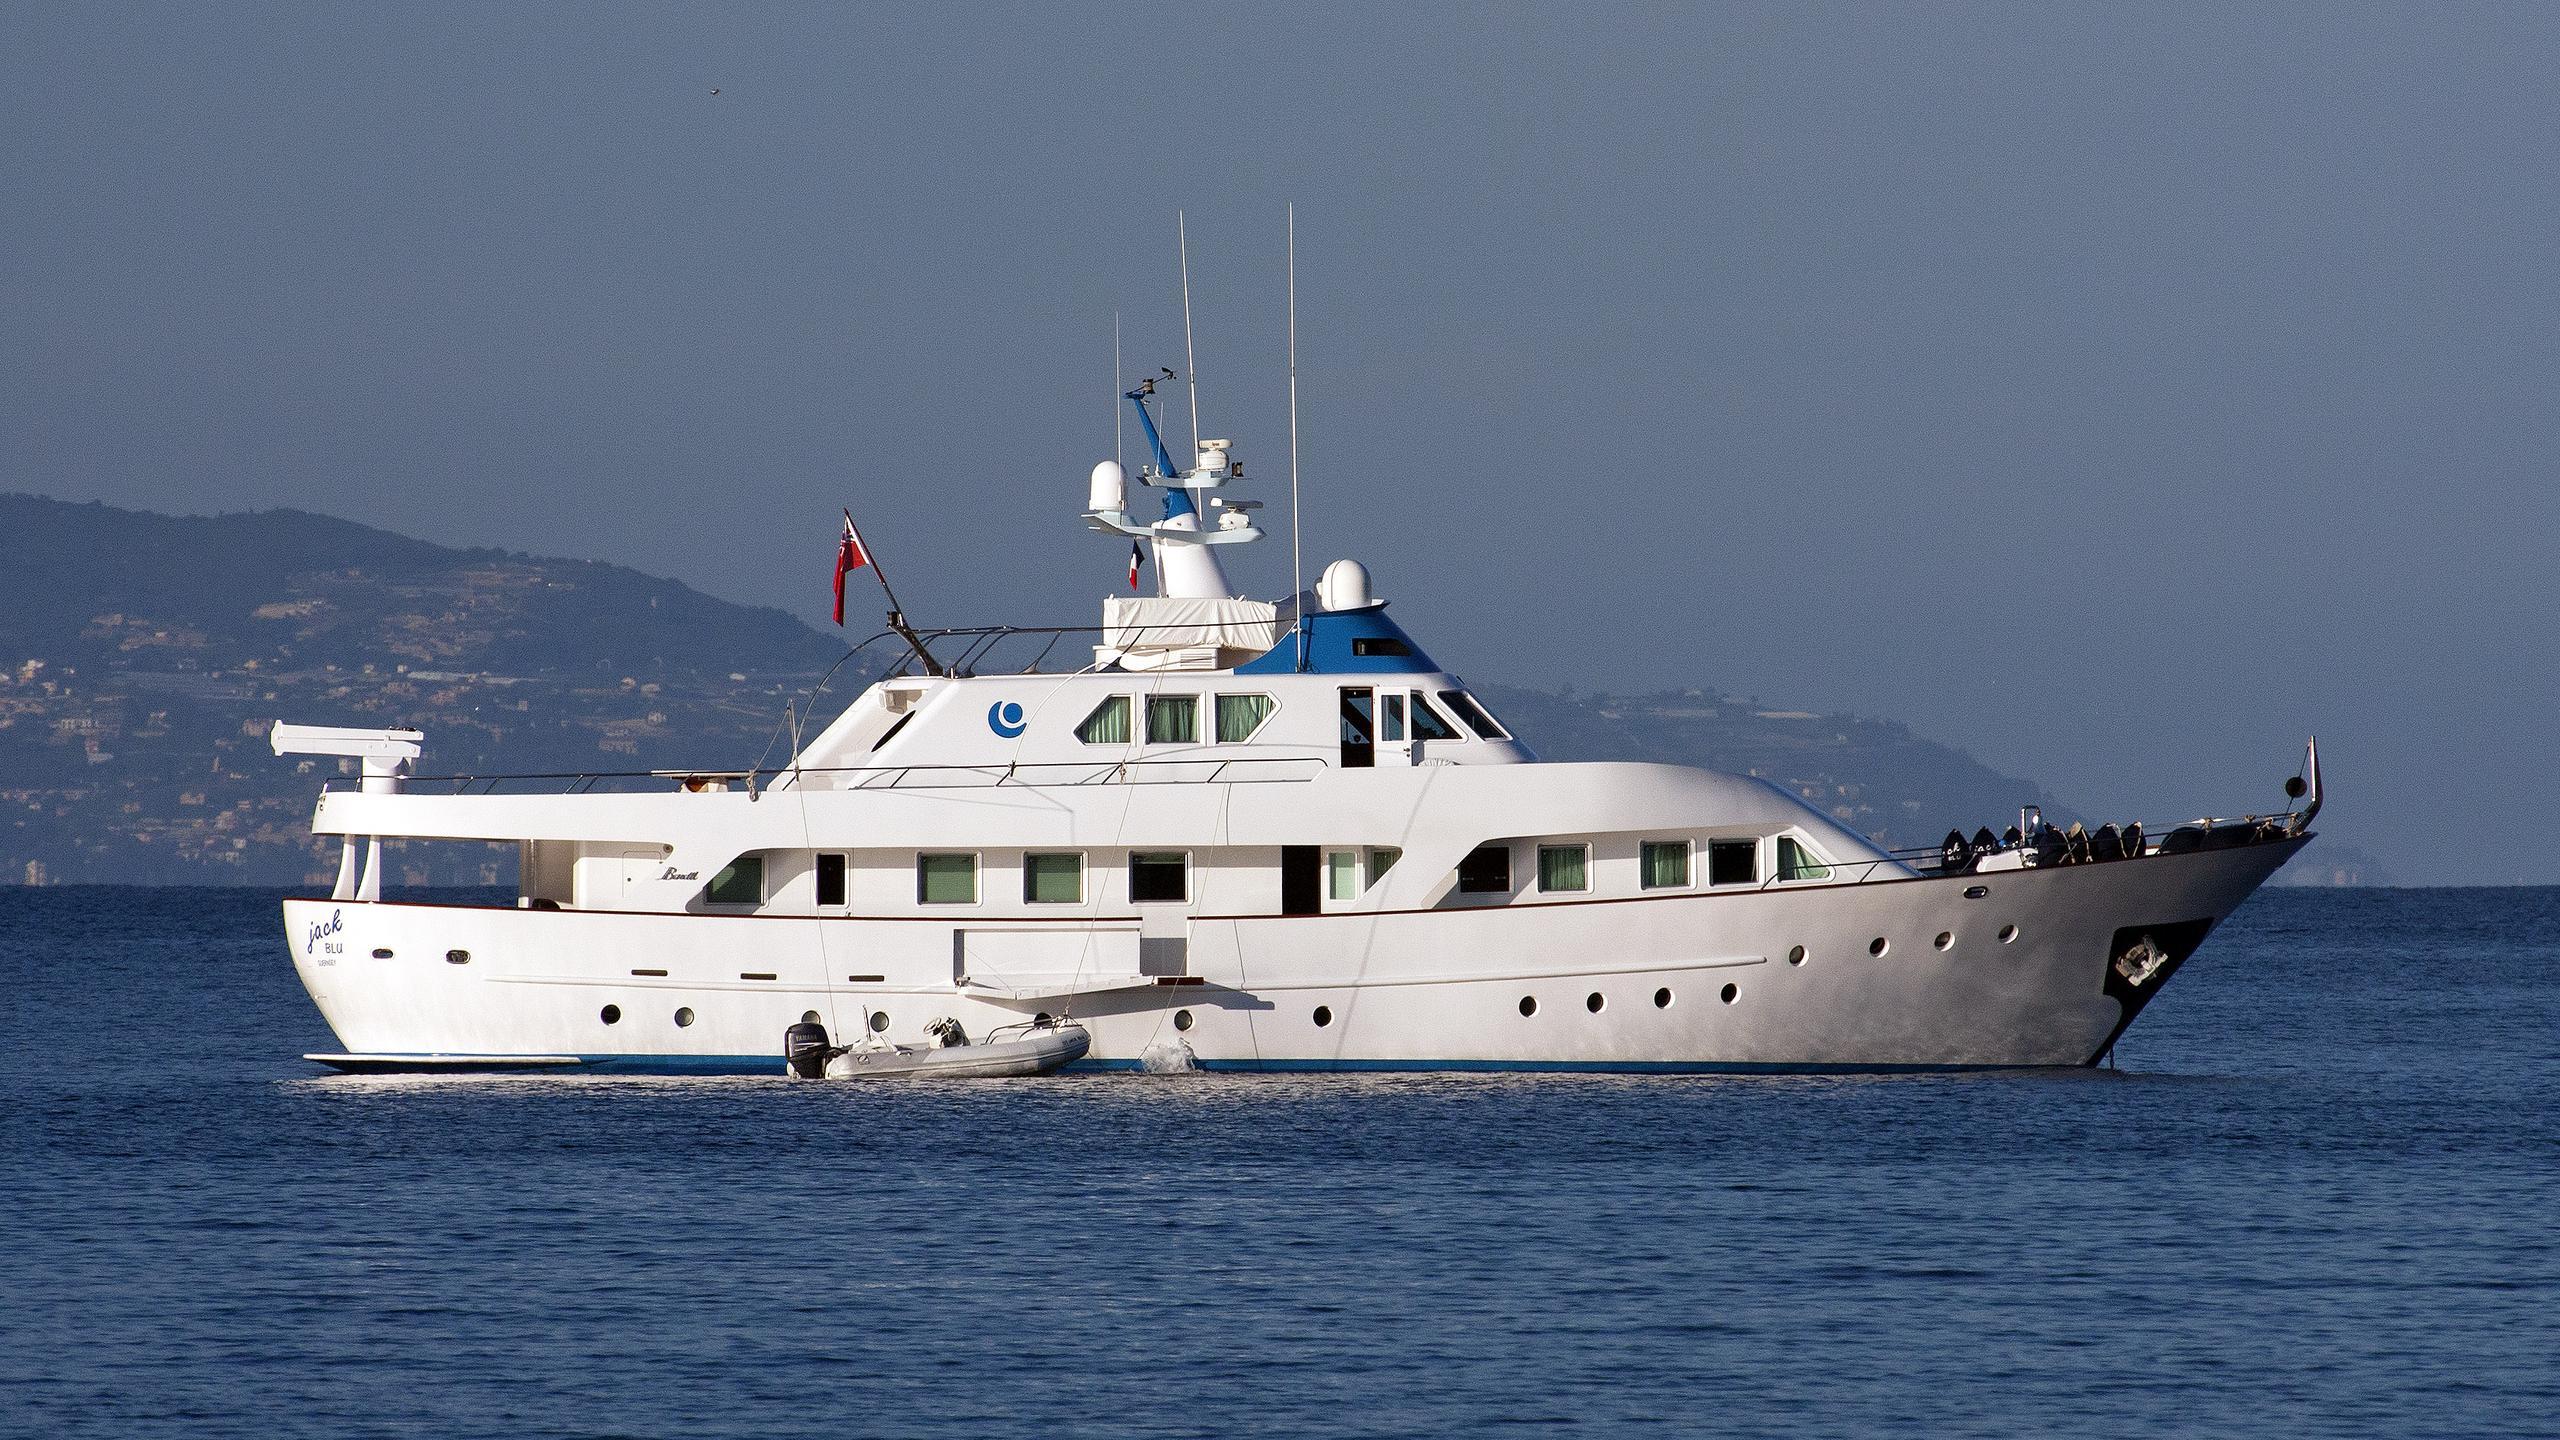 ayla-jack-blu-motor-yacht-benetti-1981-30m-profile